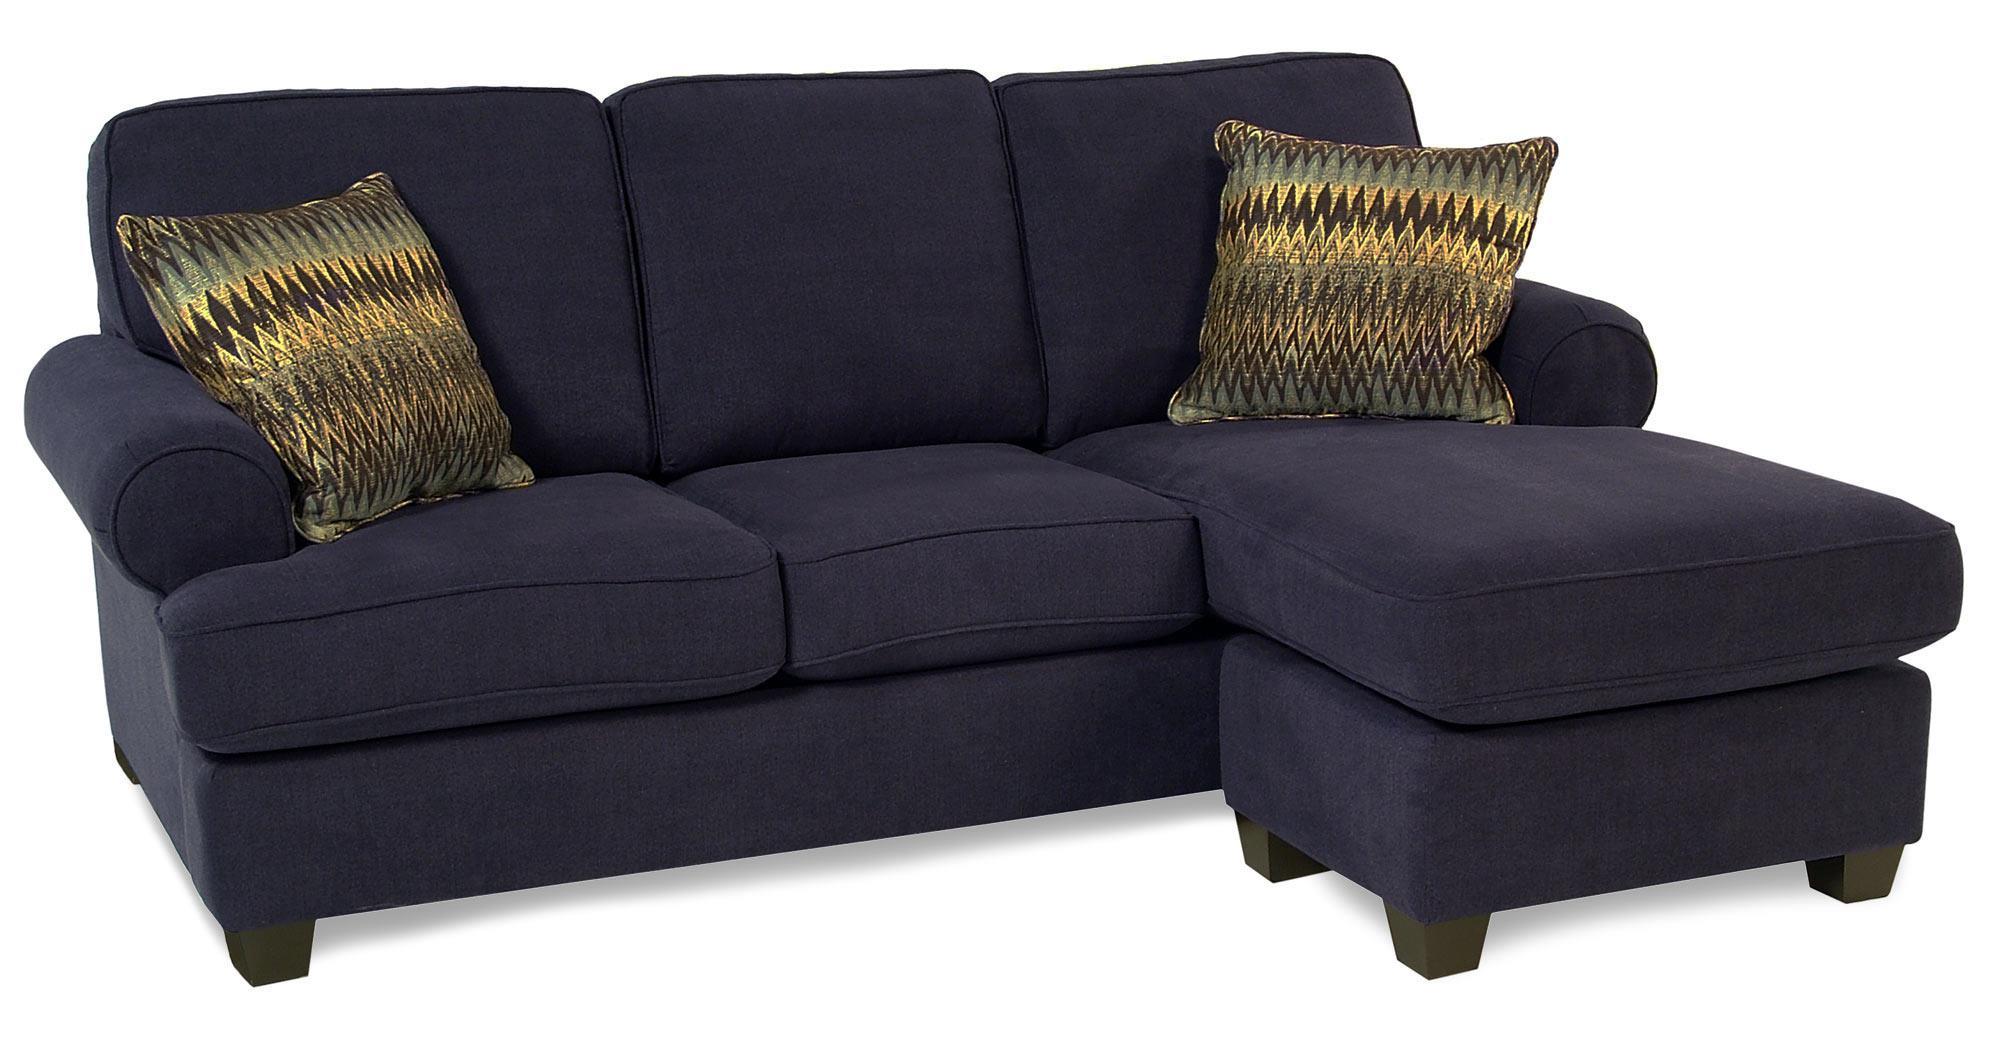 Decor-Rest Addison Sofa w/ Reversible Chaise - Item Number: 2285SRC